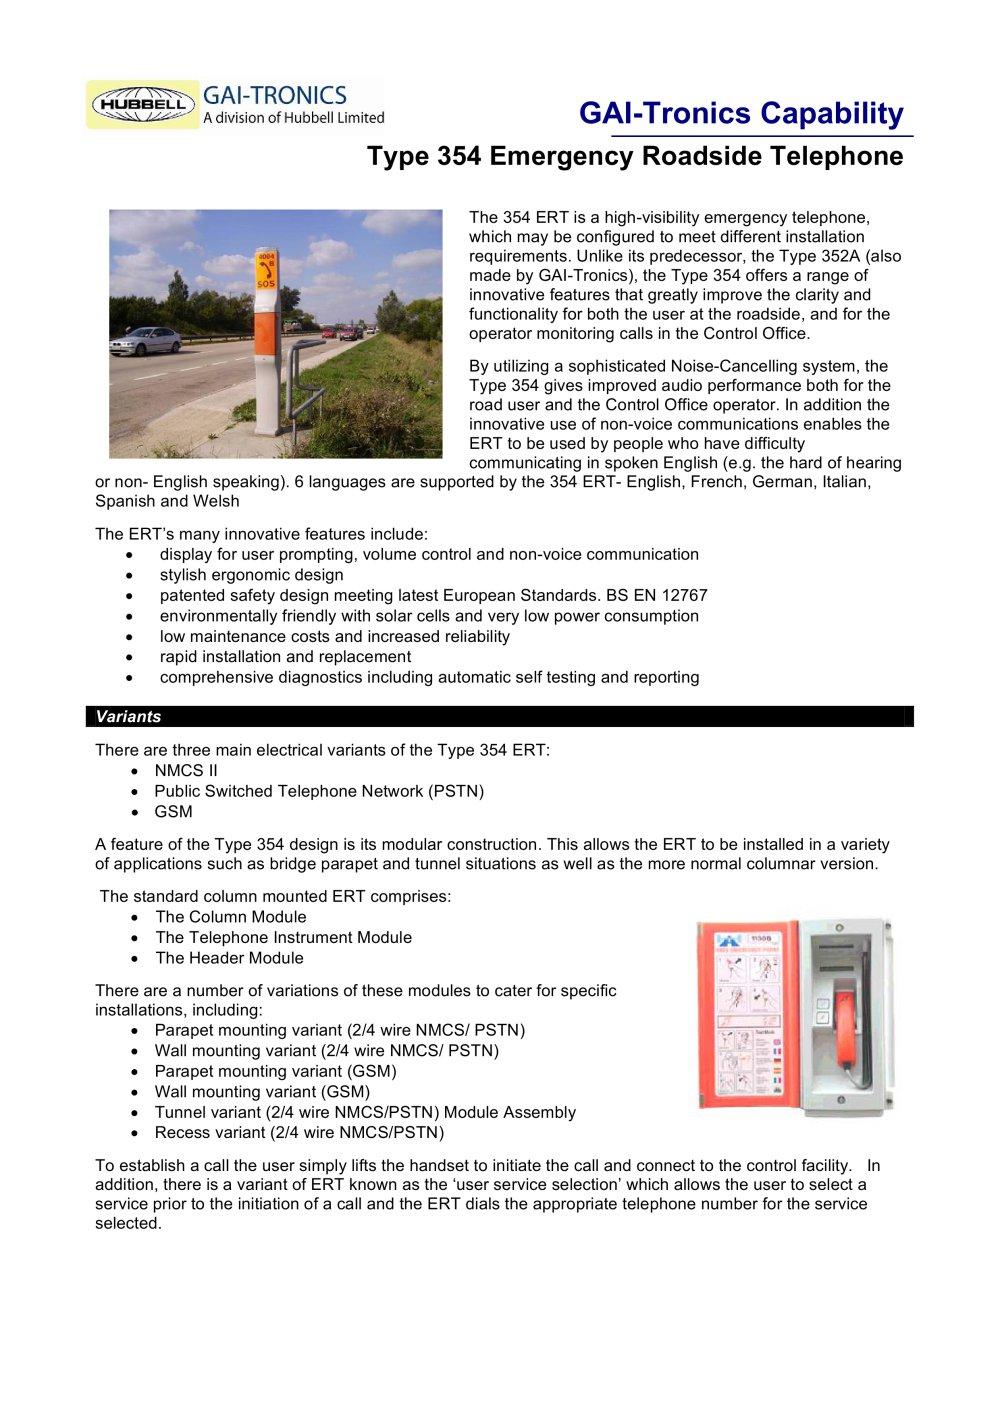 Roadside Emergency Telephone Type 354 - GAI-Tronics a division of ...